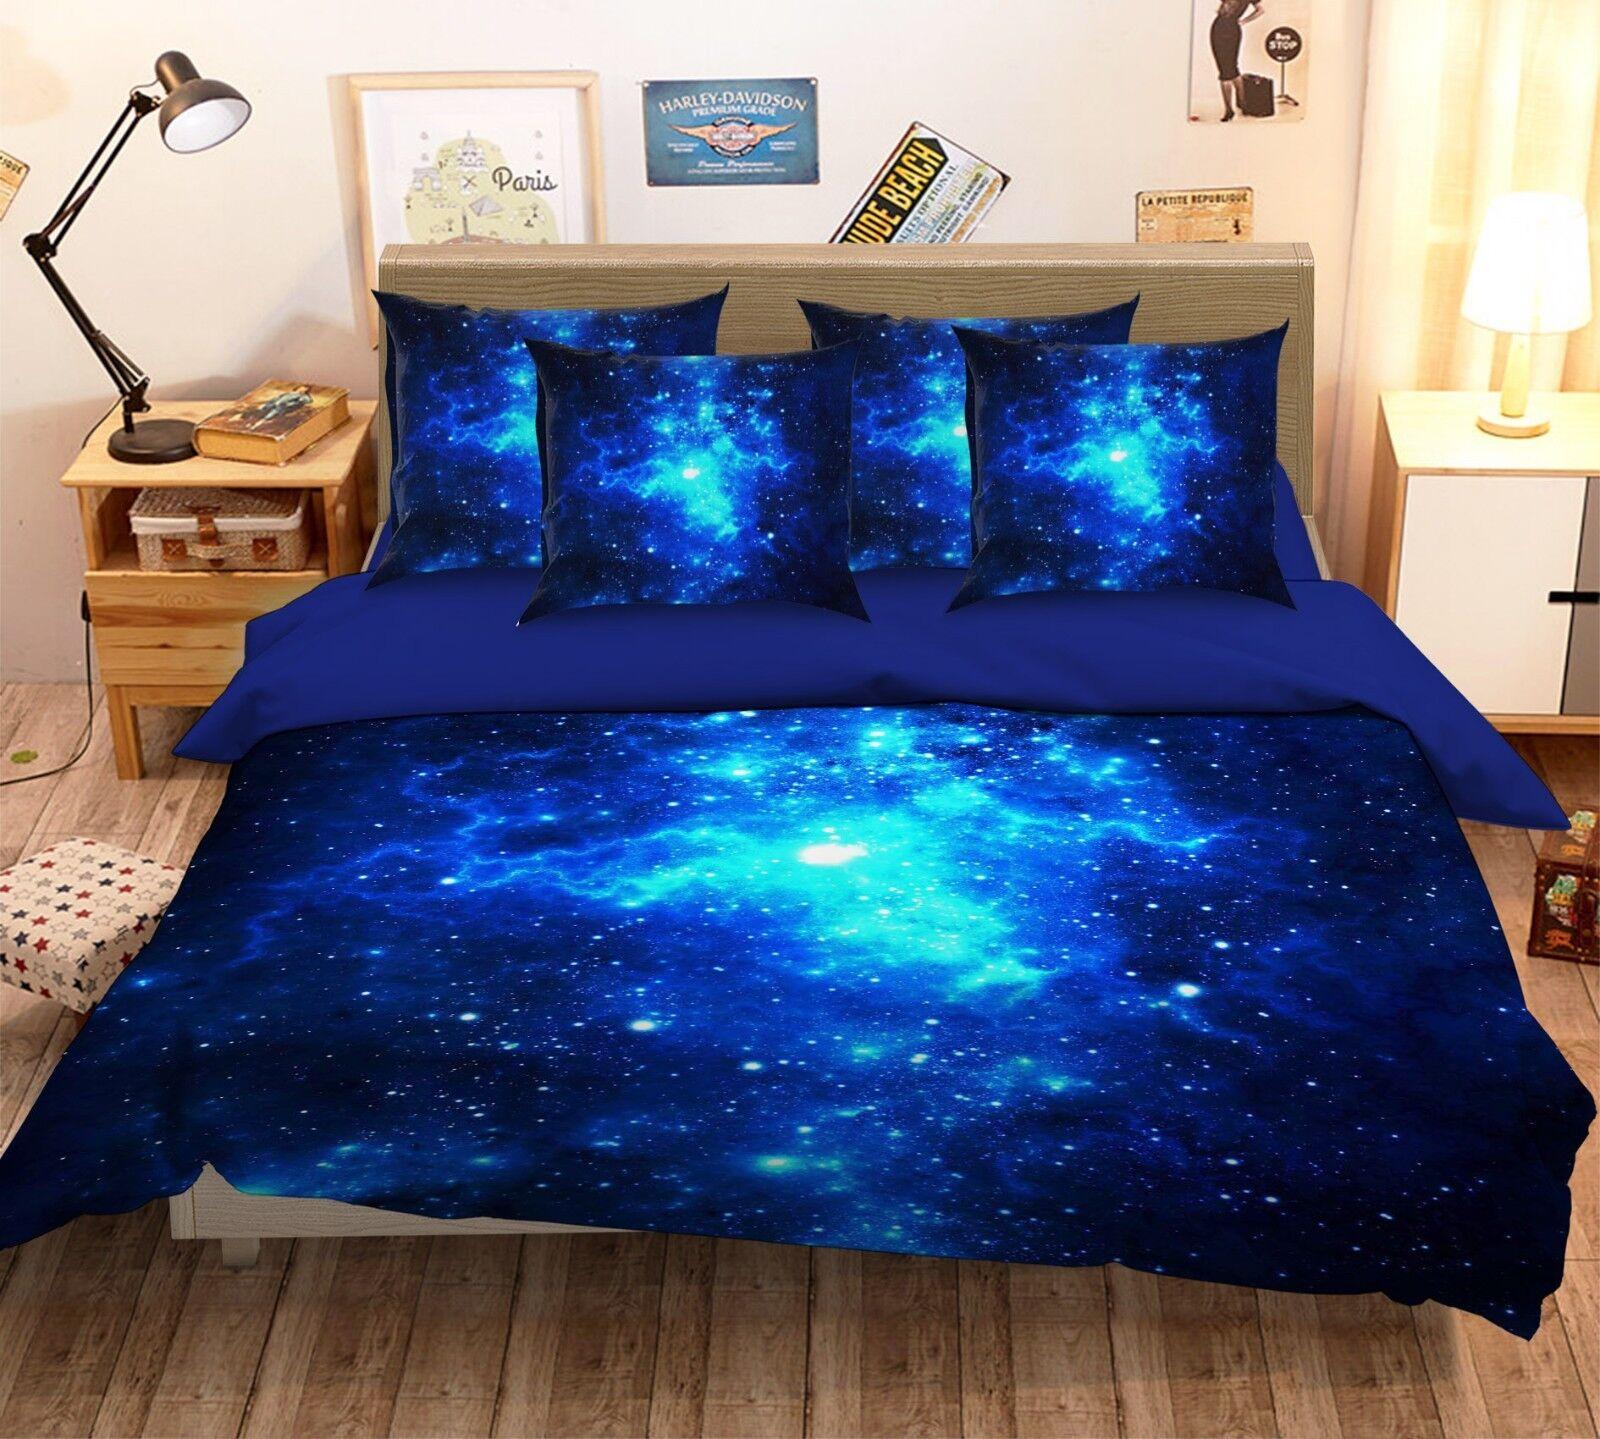 3D bluee Starry Sky 5 Bed Pillowcases Quilt Duvet Cover Set Single Queen King AU